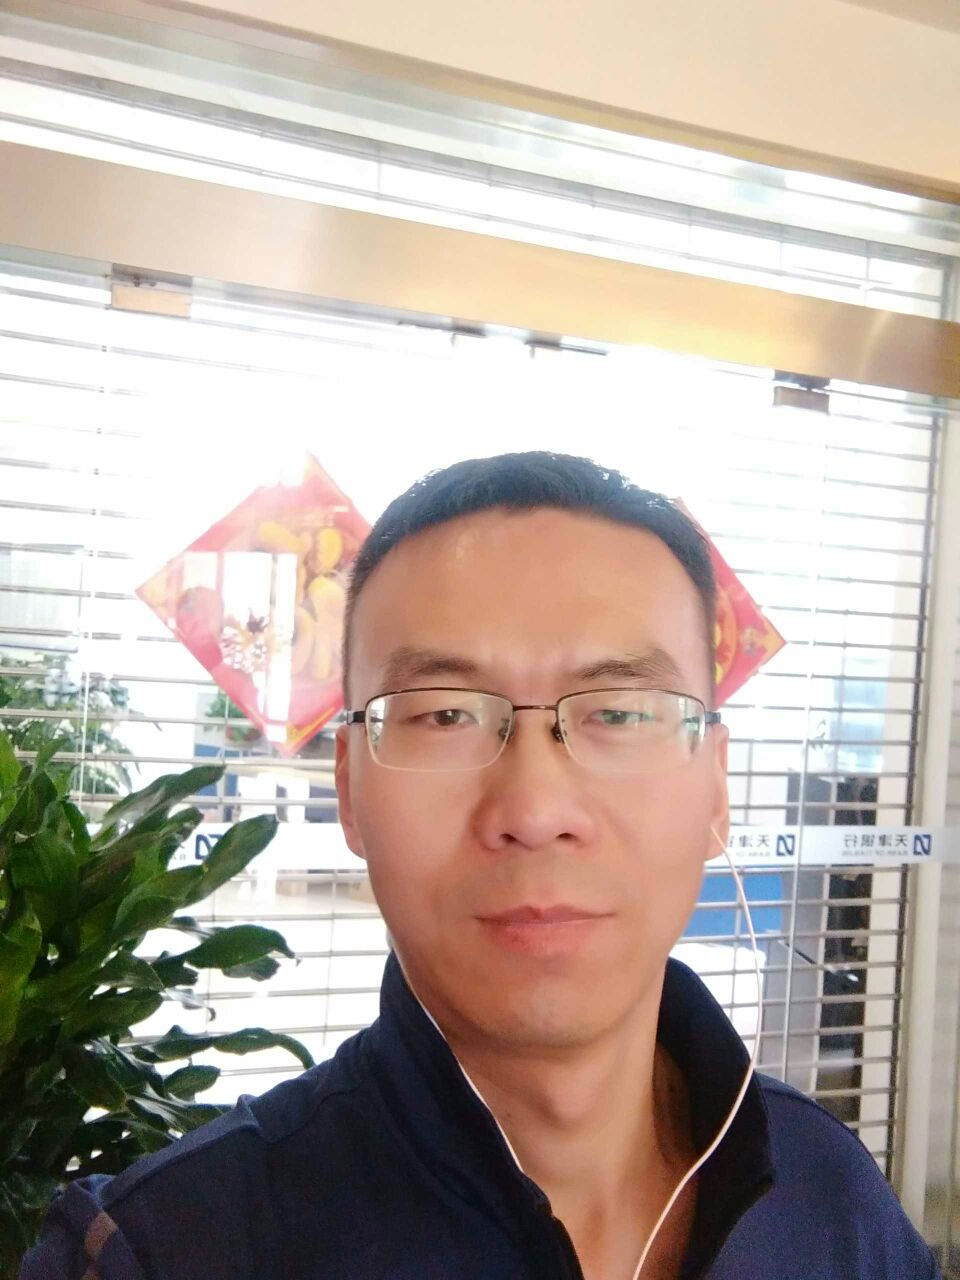 http://www.huodongxing.com/file/20170823/5432791921211/703250796854484.png